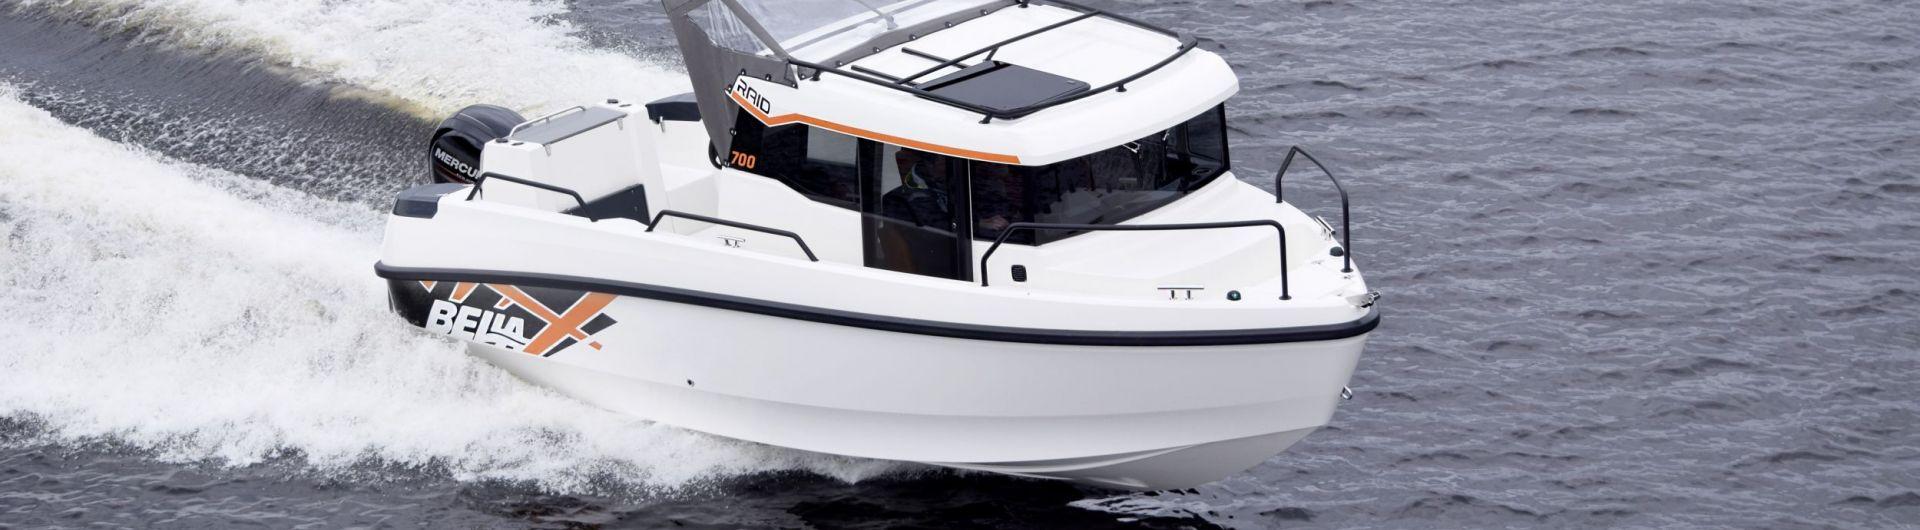 Sportboot Bella 700 Raid 1